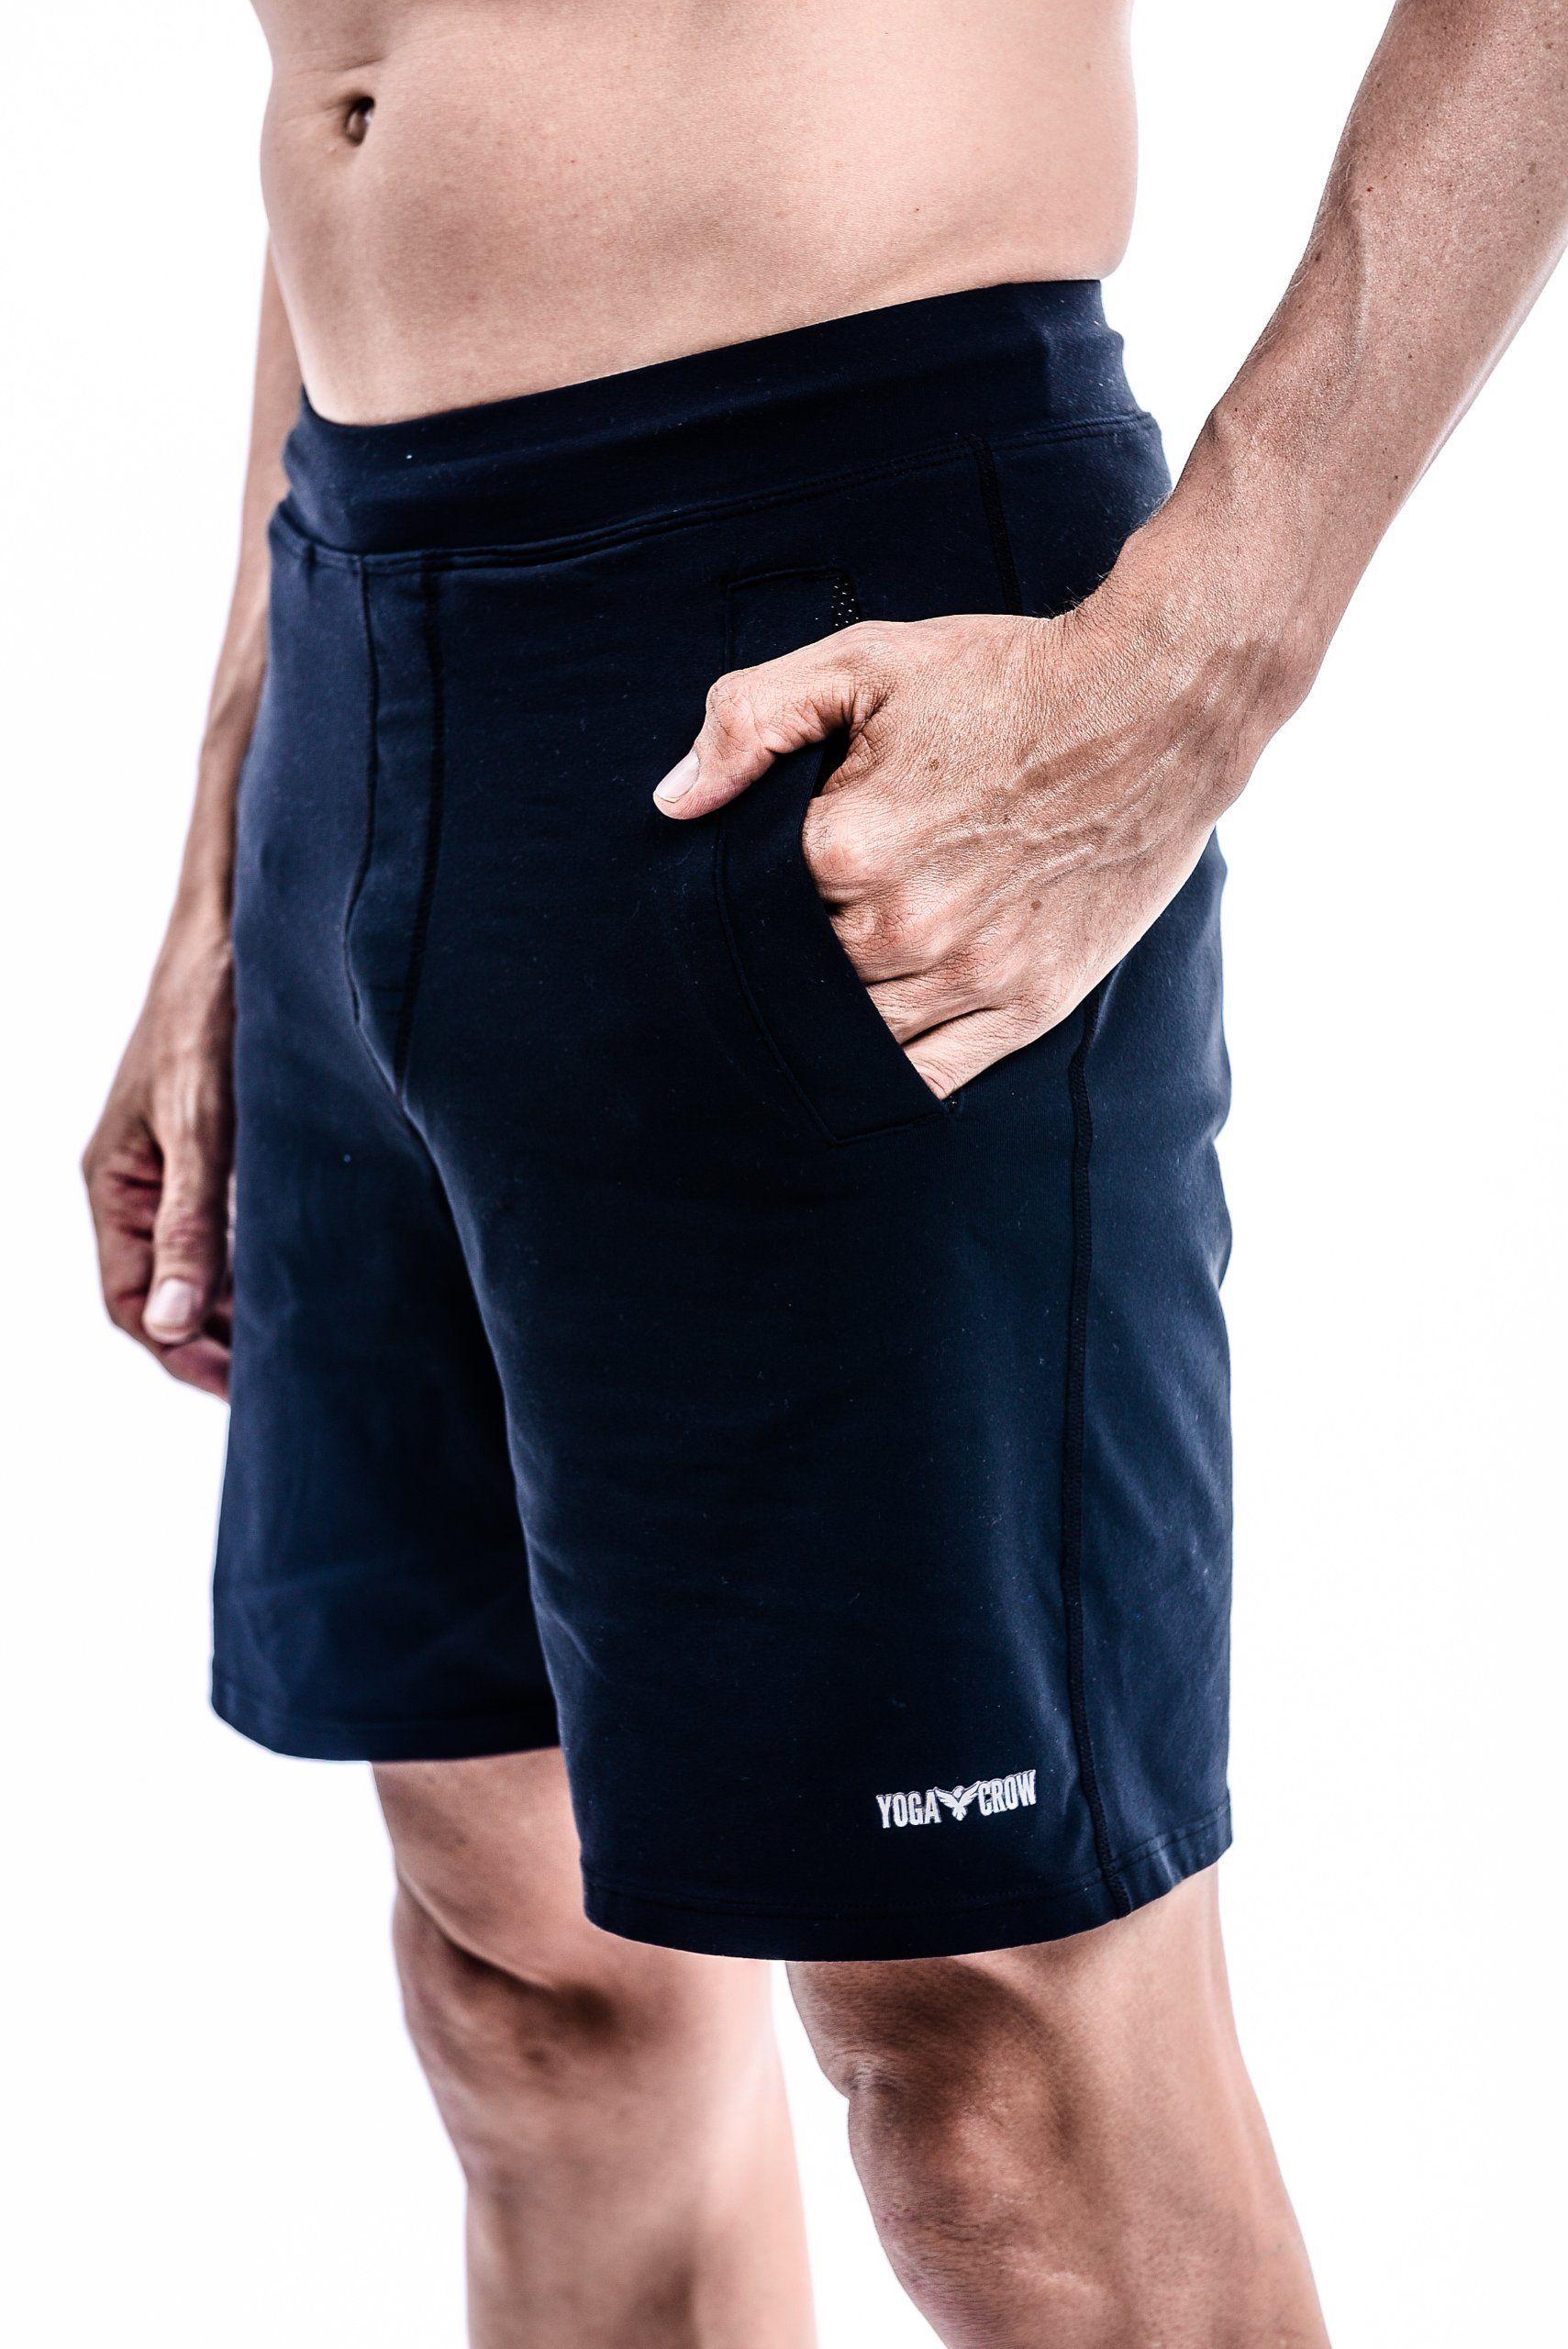 2ea6773561 Yoga Crow The Swerve Yoga Shorts - Black : THE SWERVE YOGA SHORT ...